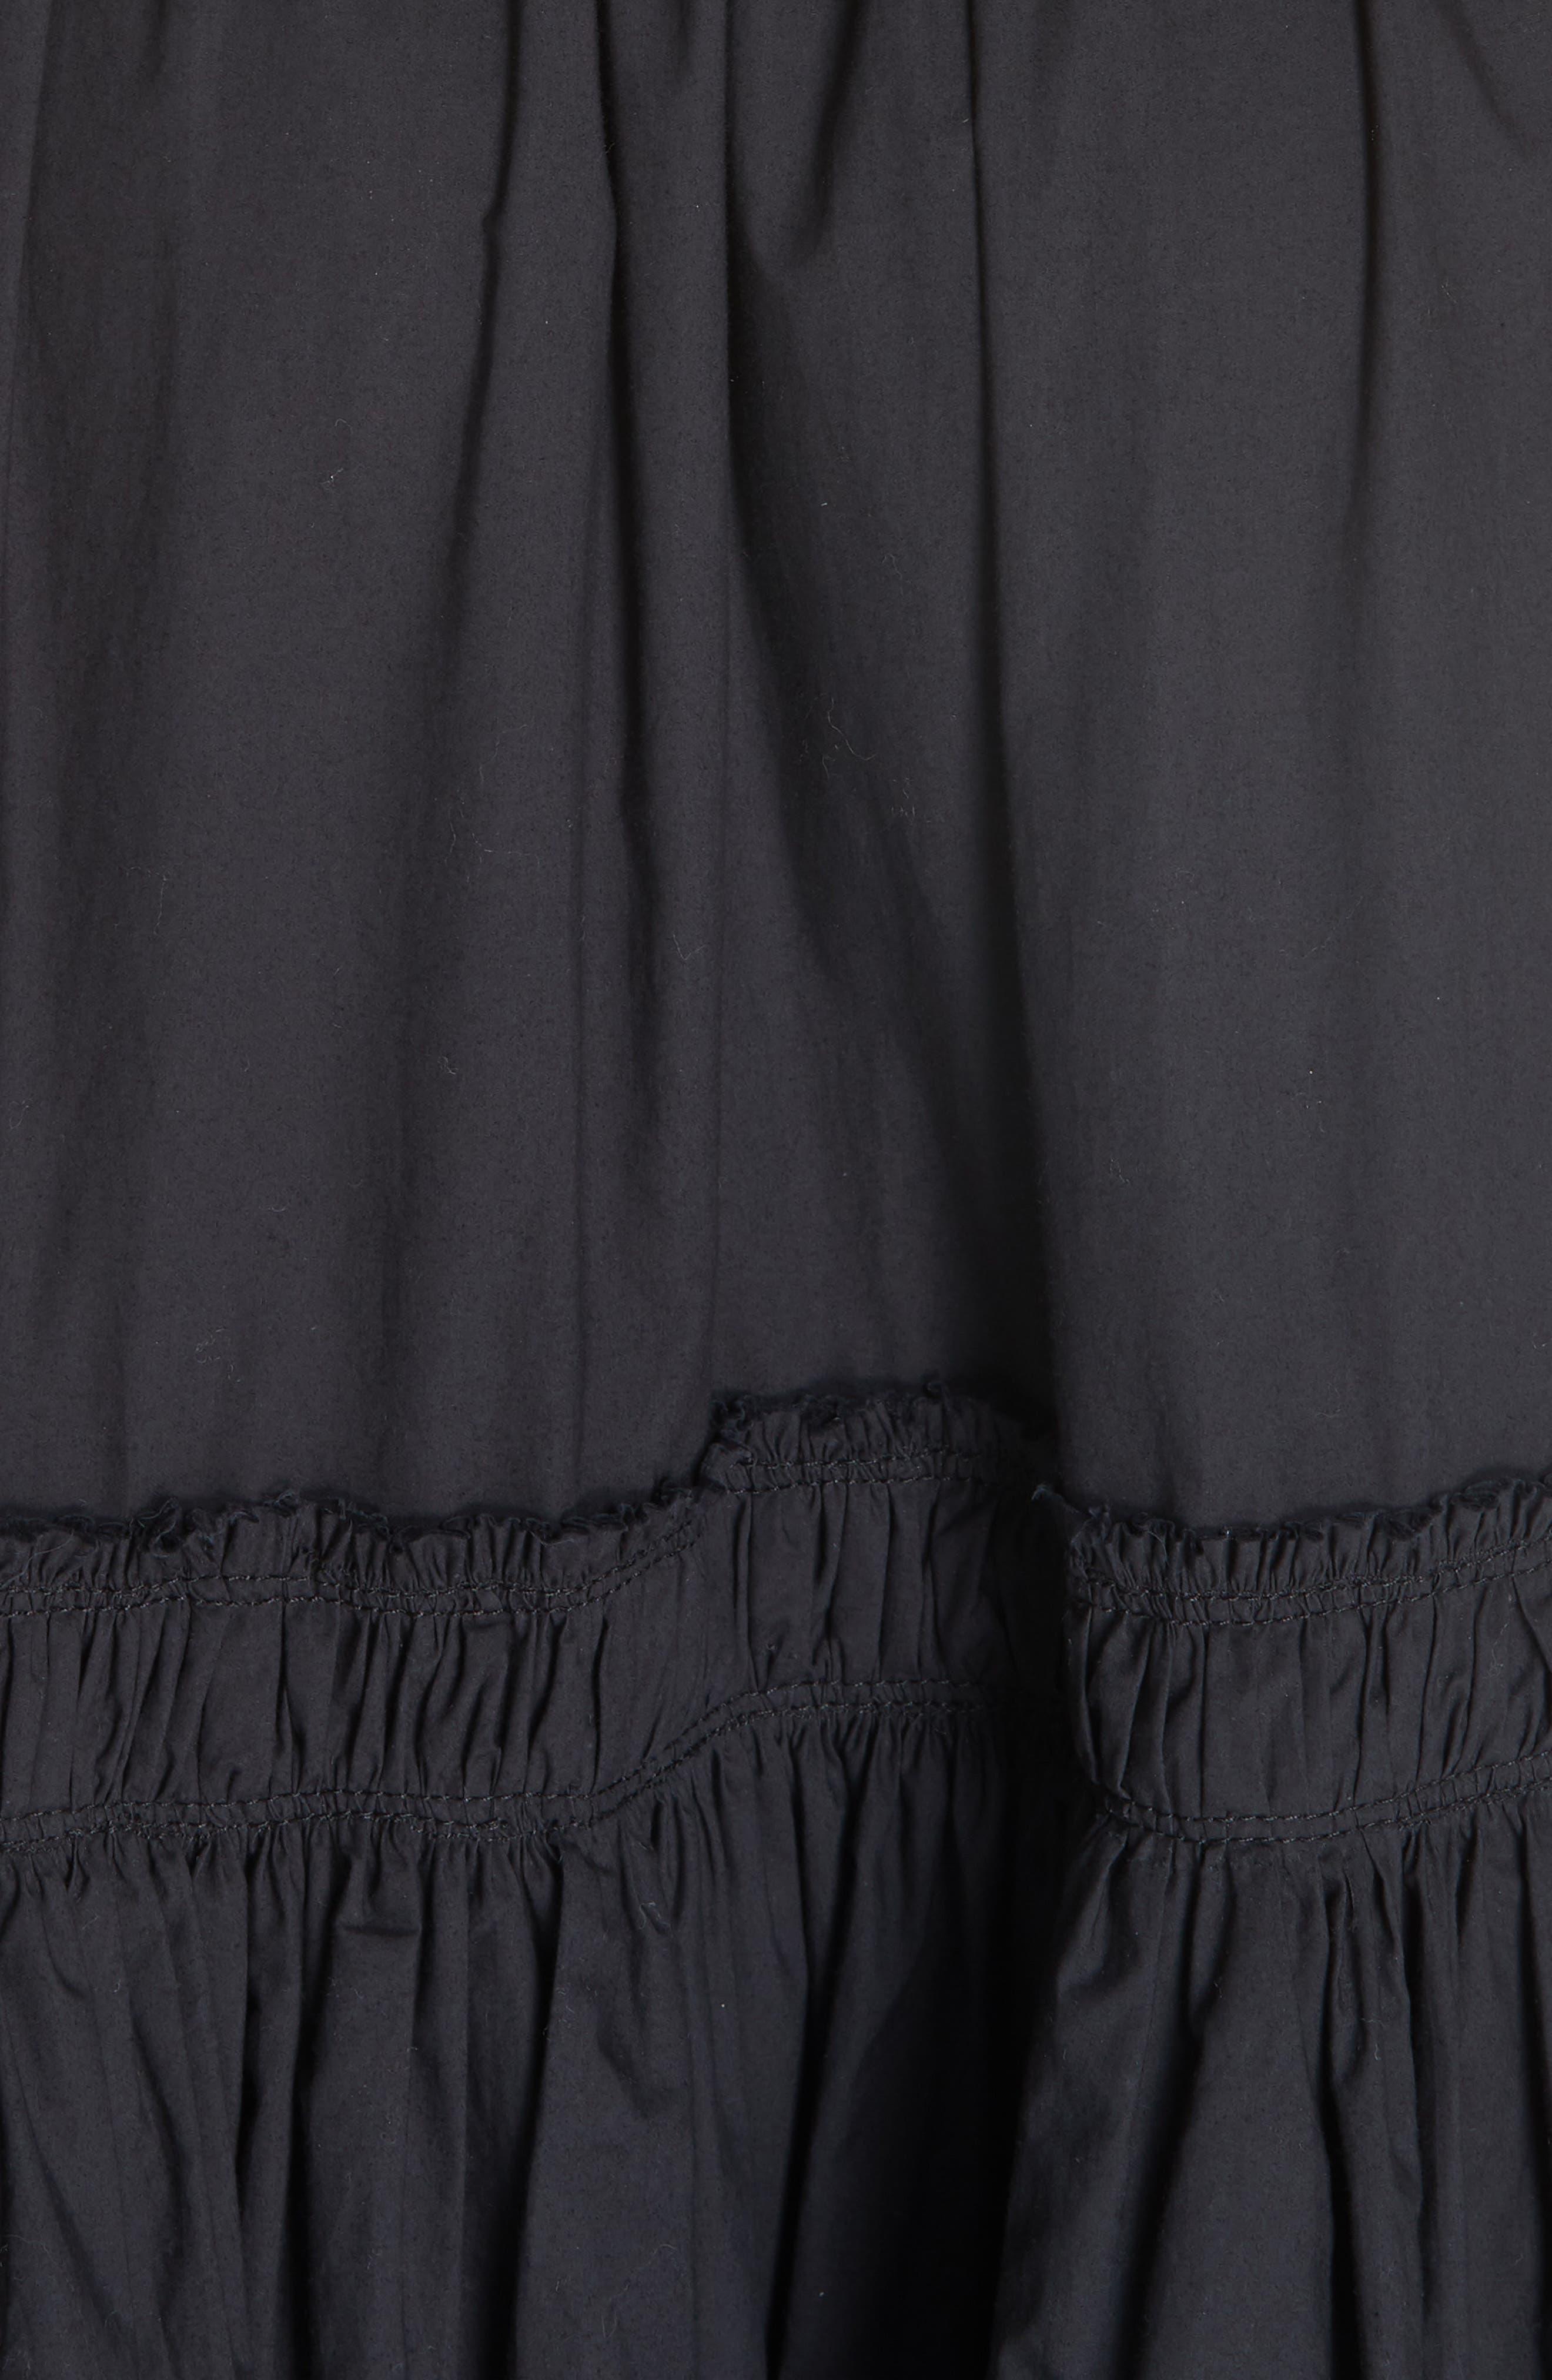 PROENZA SCHOULER, Smocked Poplin Dress, Alternate thumbnail 6, color, BLACK